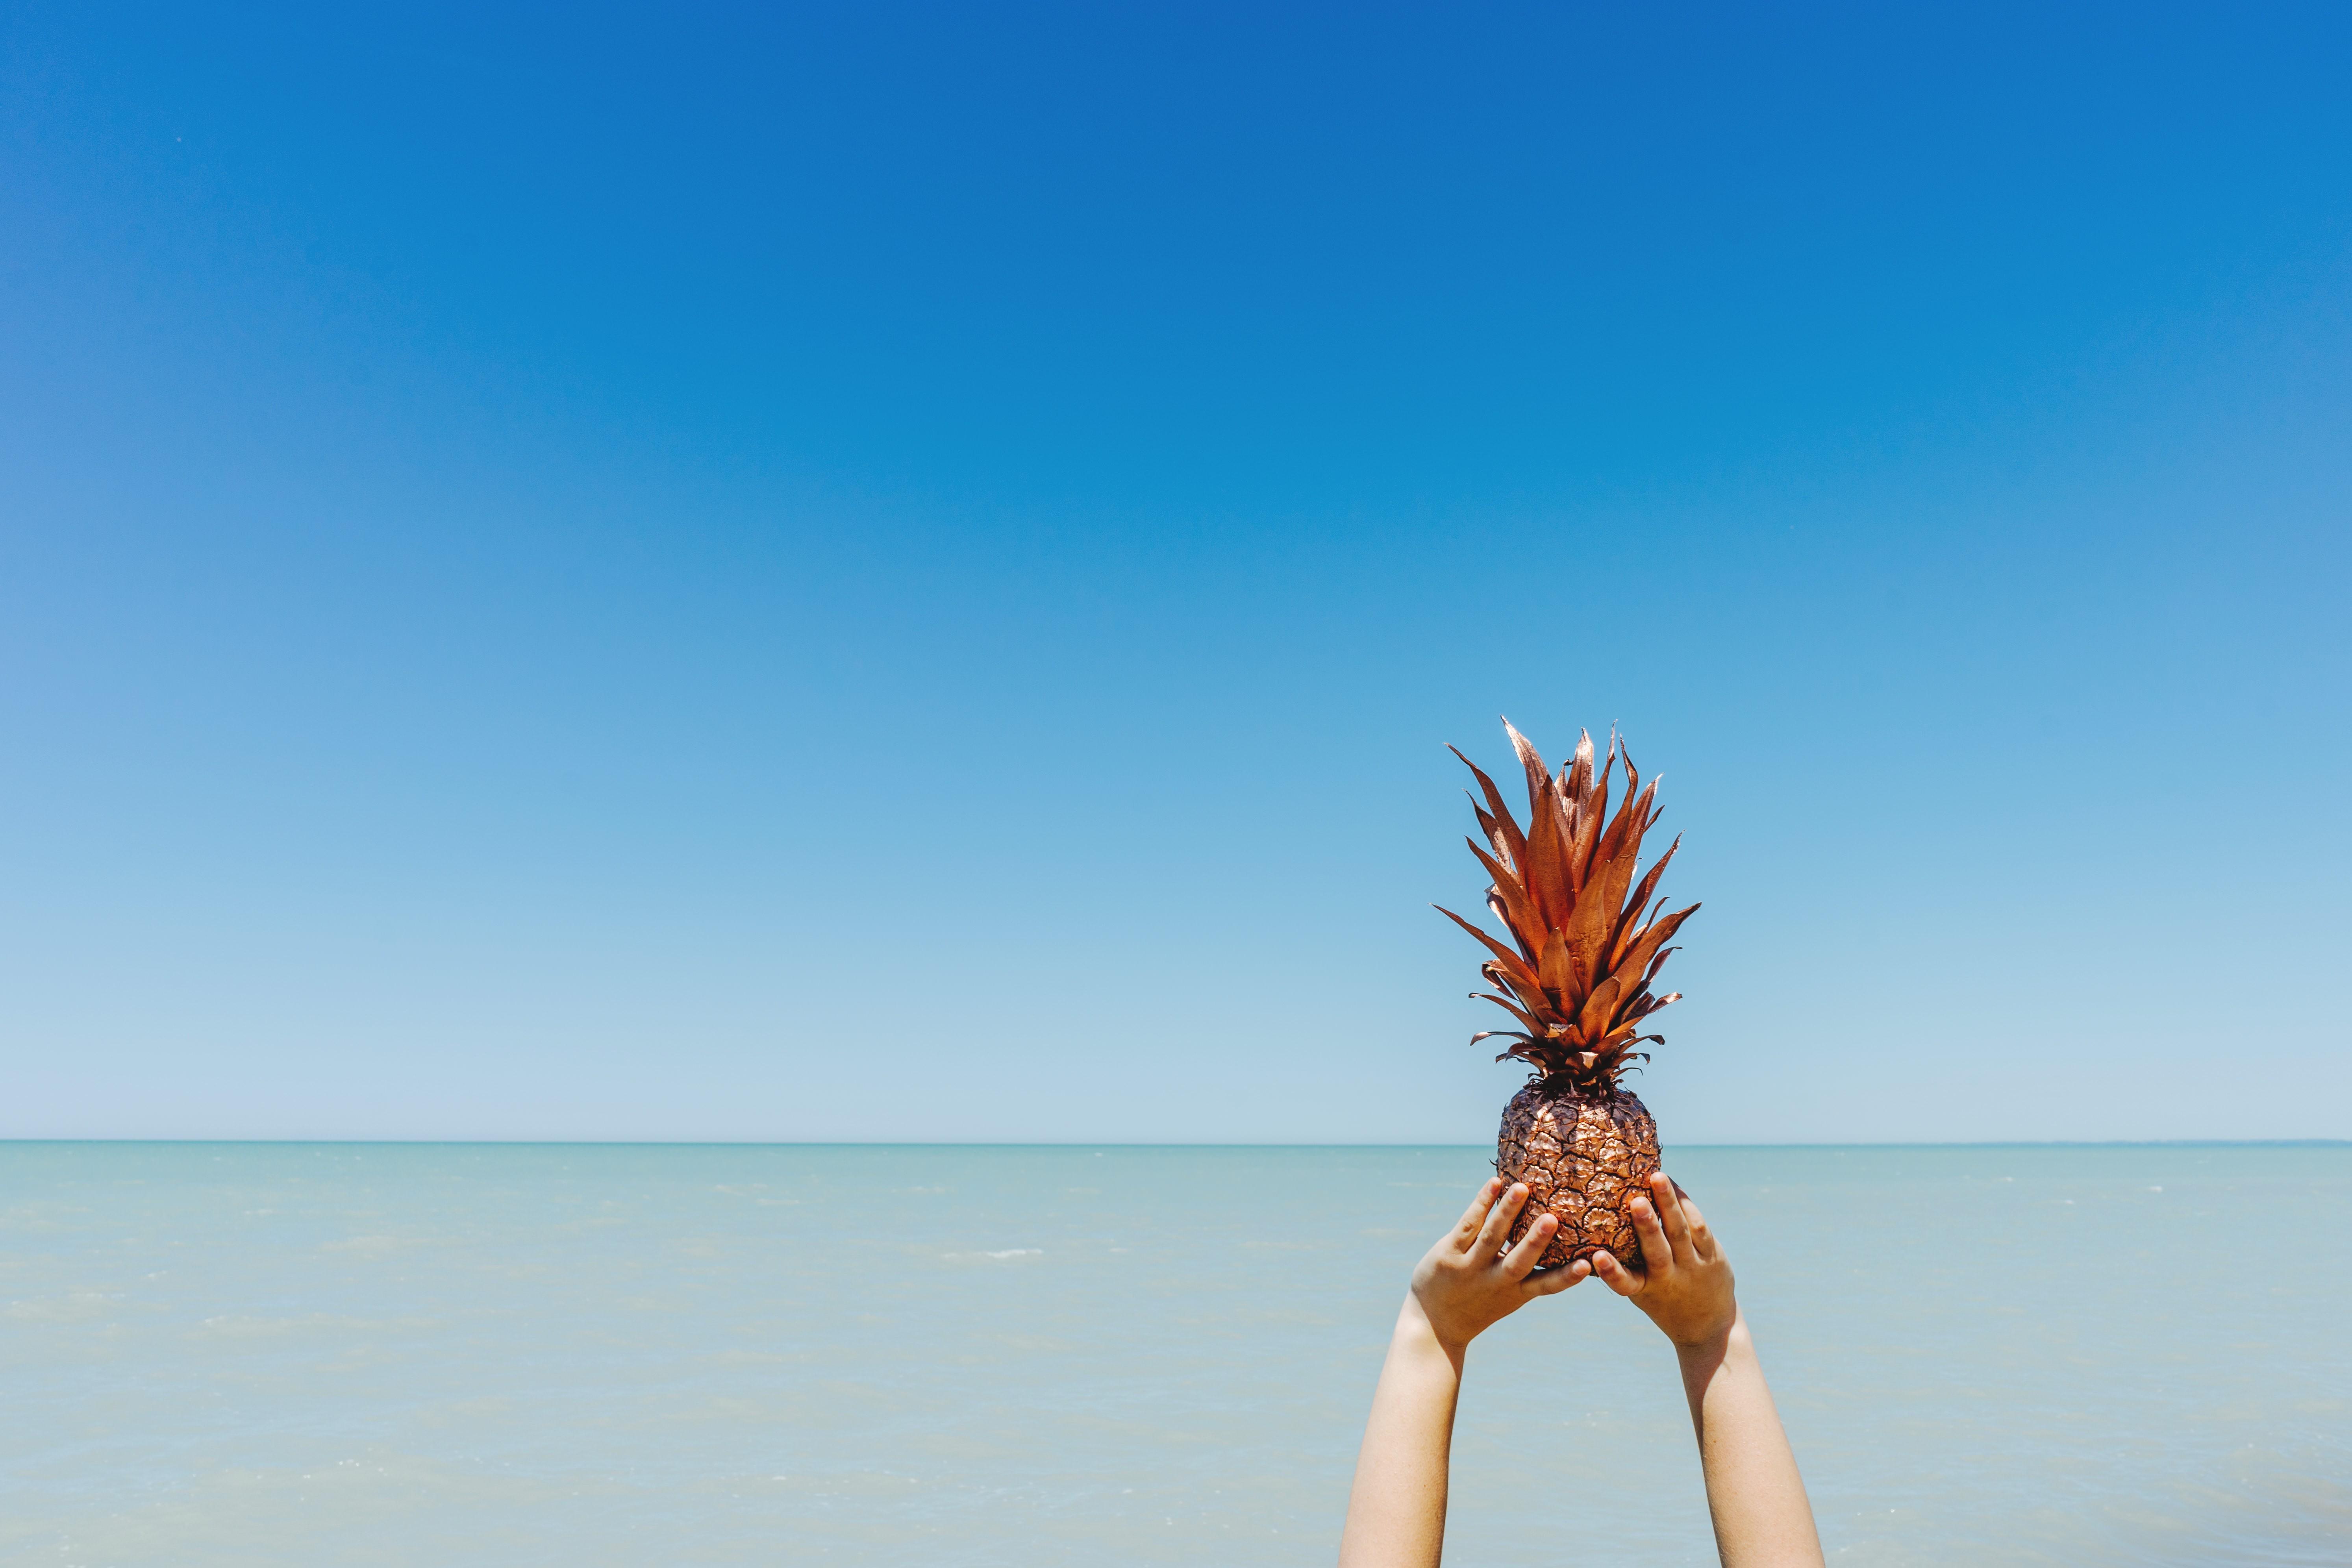 General 5974x3983 nature pineapples plants fruit minimalism